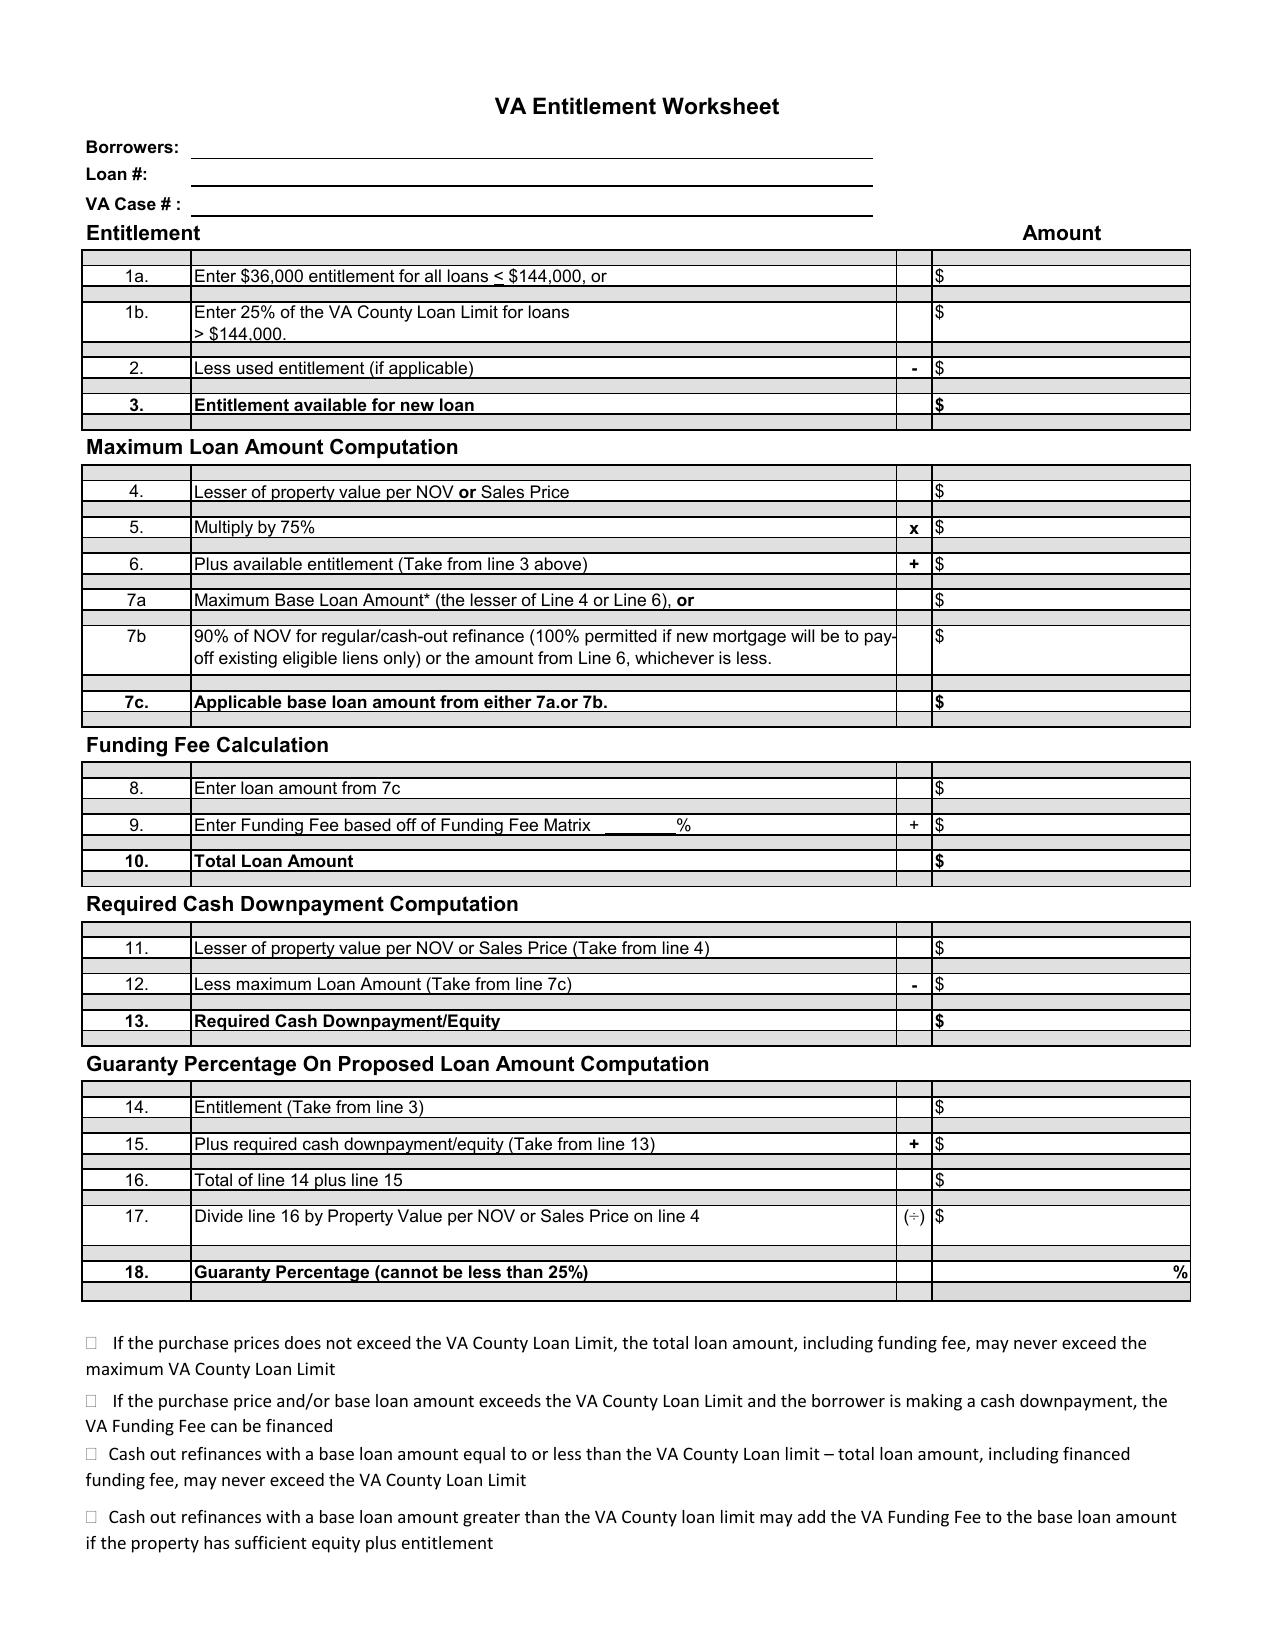 Va Max Loan Amount Worksheet